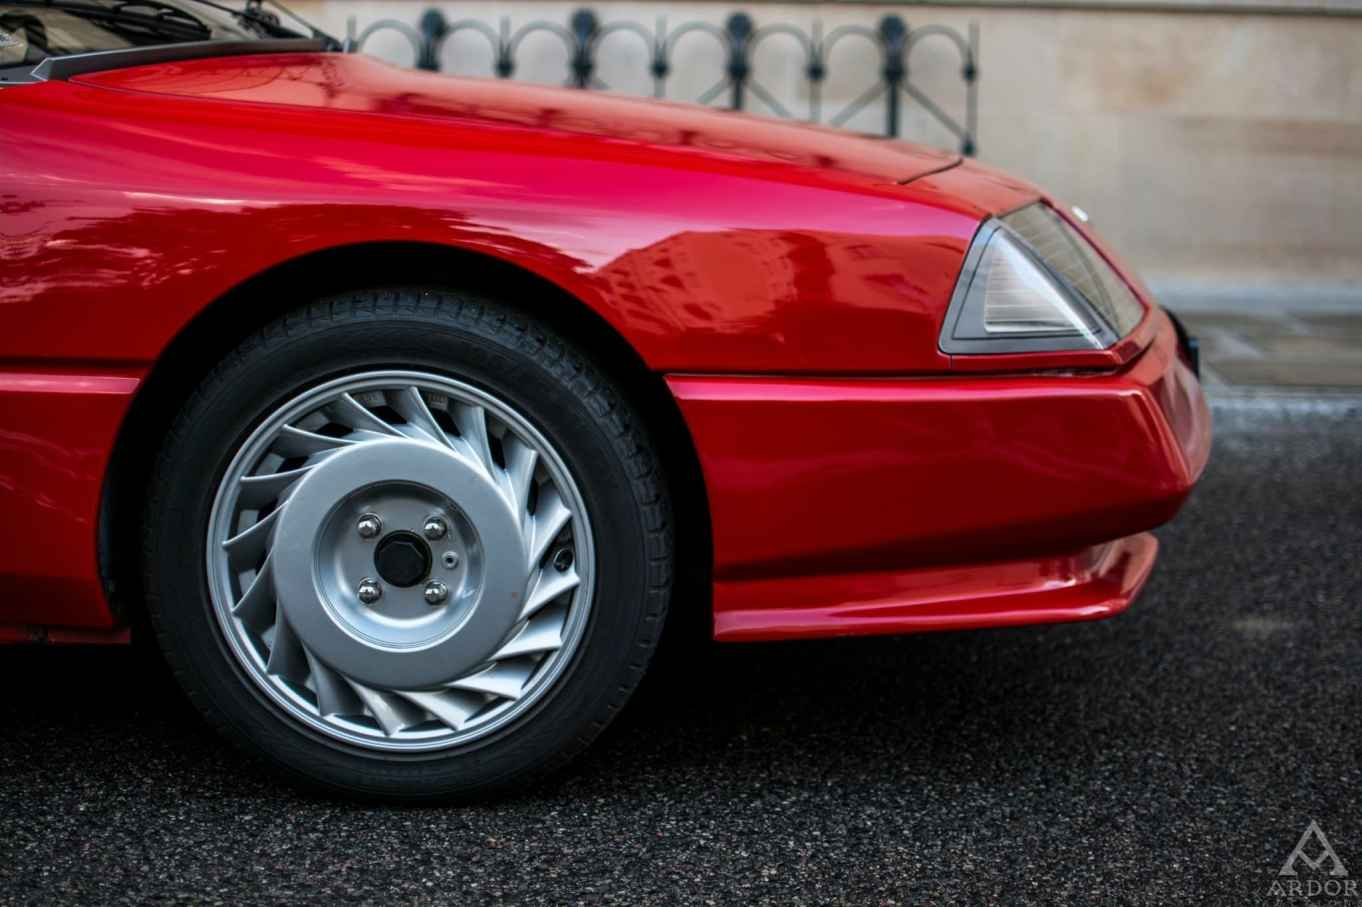 alpine-gta-v6-turbo-1987-auction-ardor-31